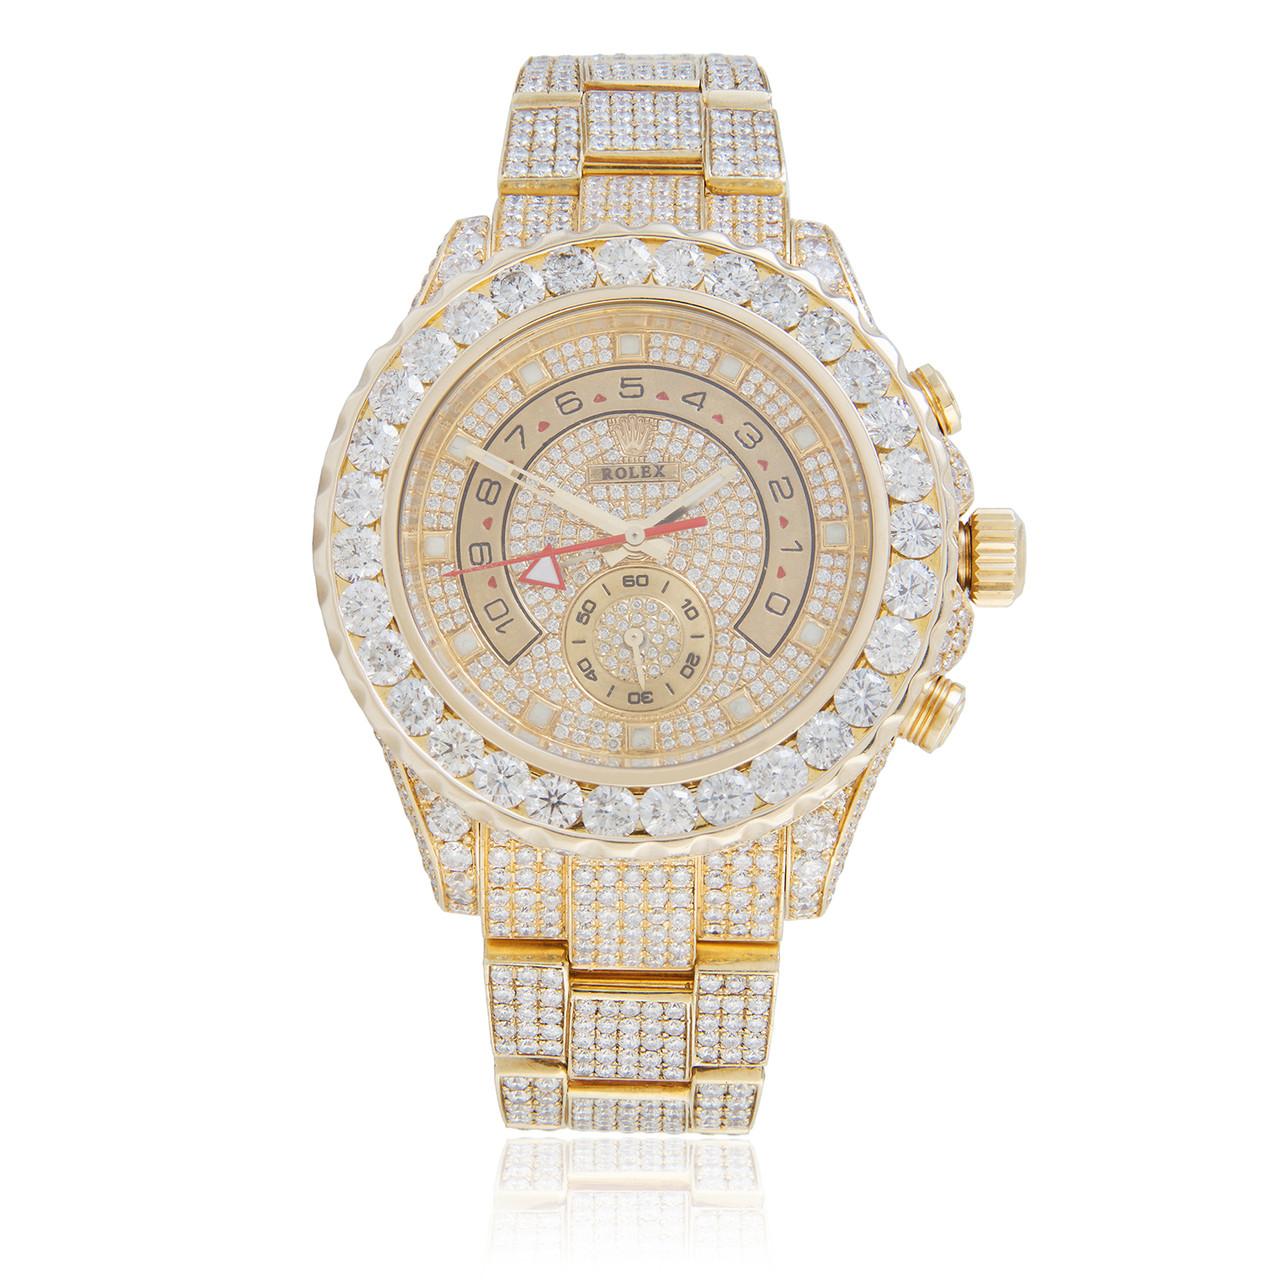 Rolex Yacht Master Ii 18k Yellow Gold 35ct Diamond Automatic Men S Watch